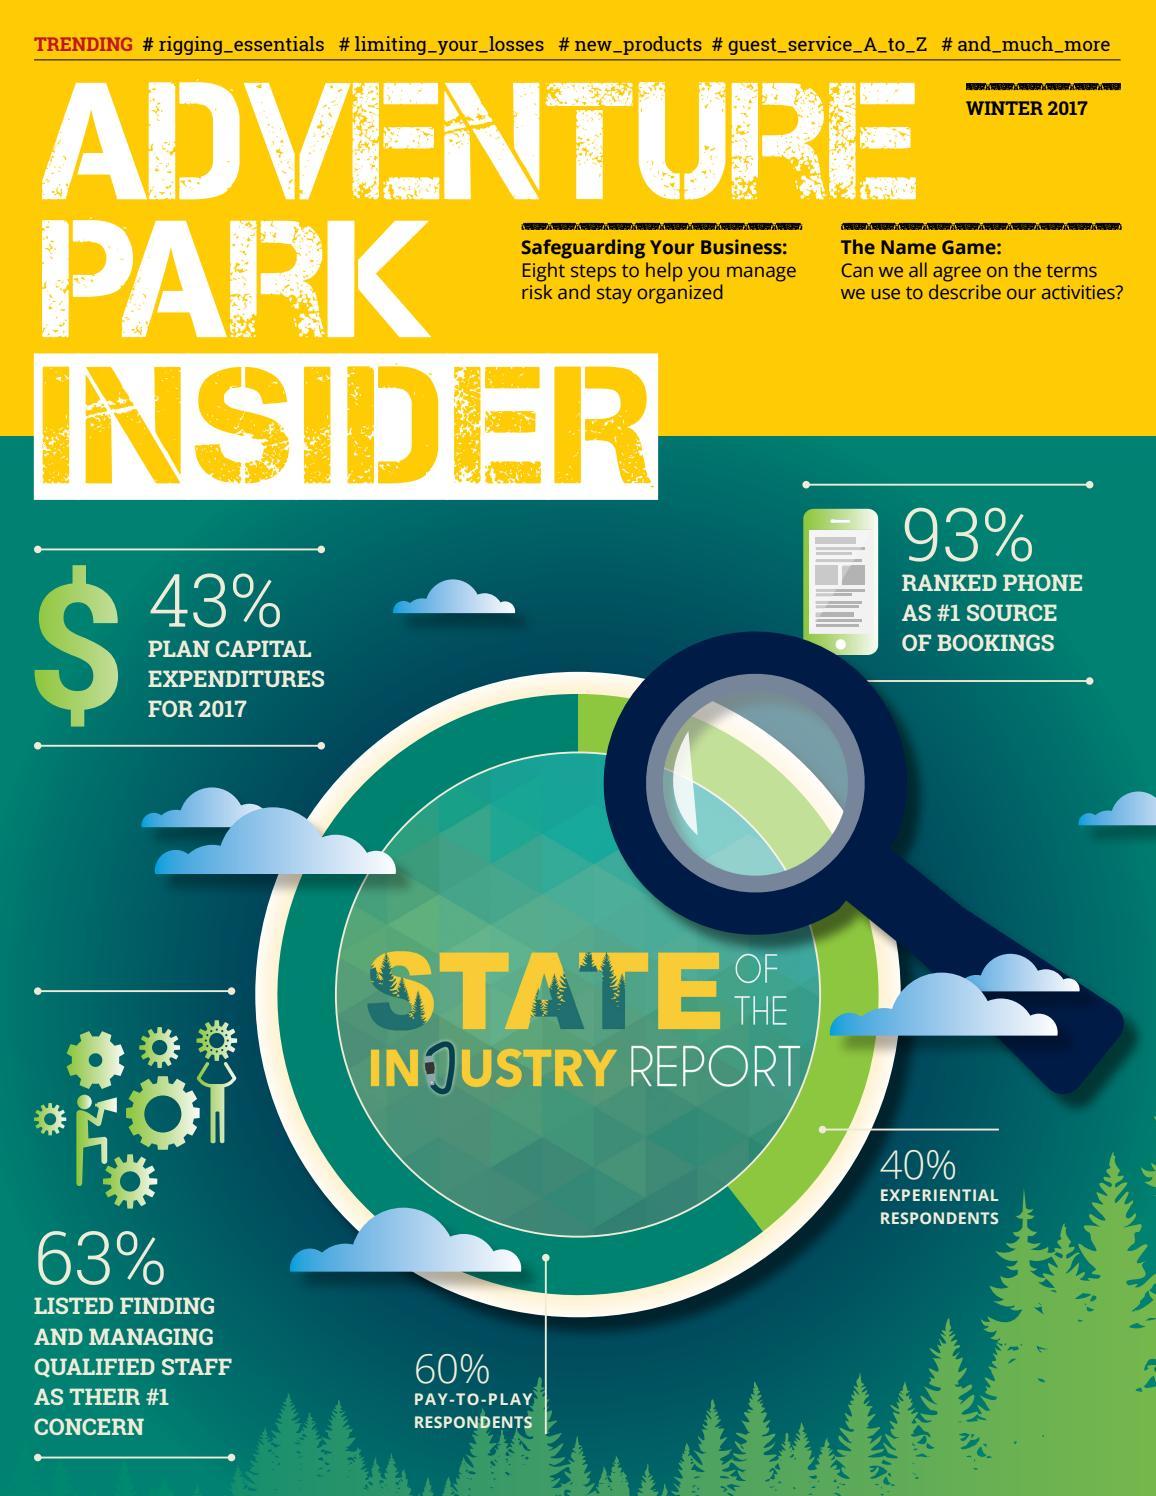 Adventure Park Insider Winter 2017 by Beardsley Publishing - issuu